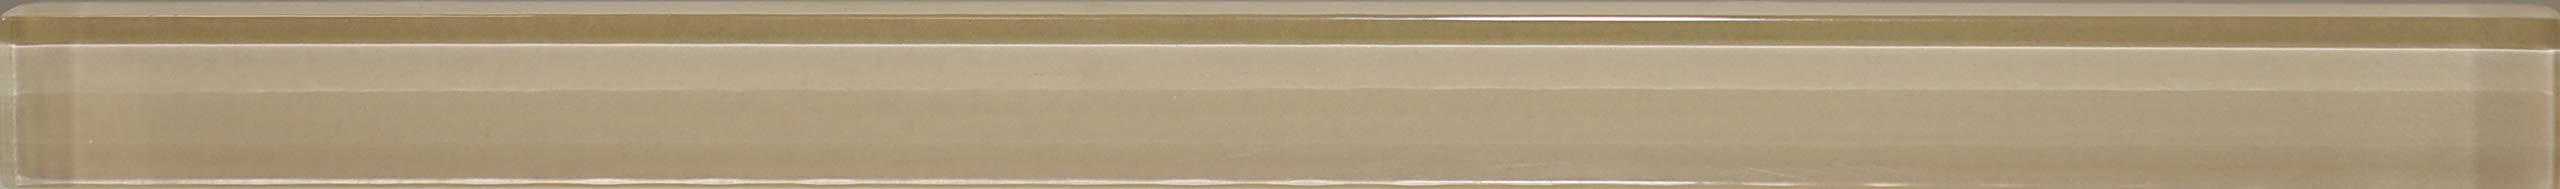 Manhattan 5/8X8 Glass Pencil Beige